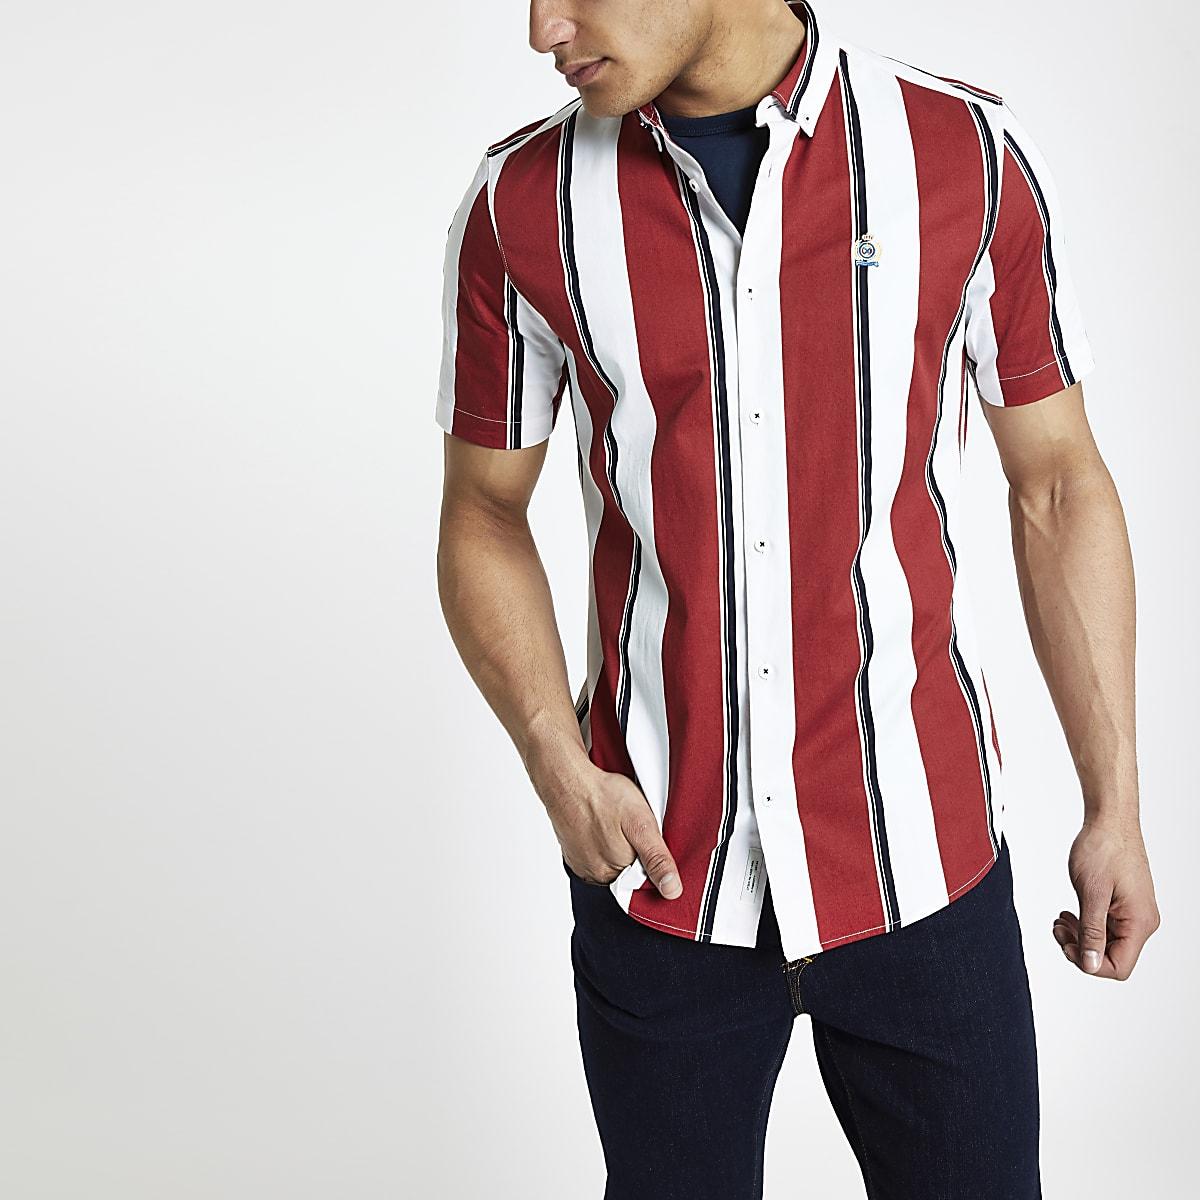 Rood Overhemd Slim Fit.Rood Gestreept Slim Fit Overhemd Overhemden Met Korte Mouwen